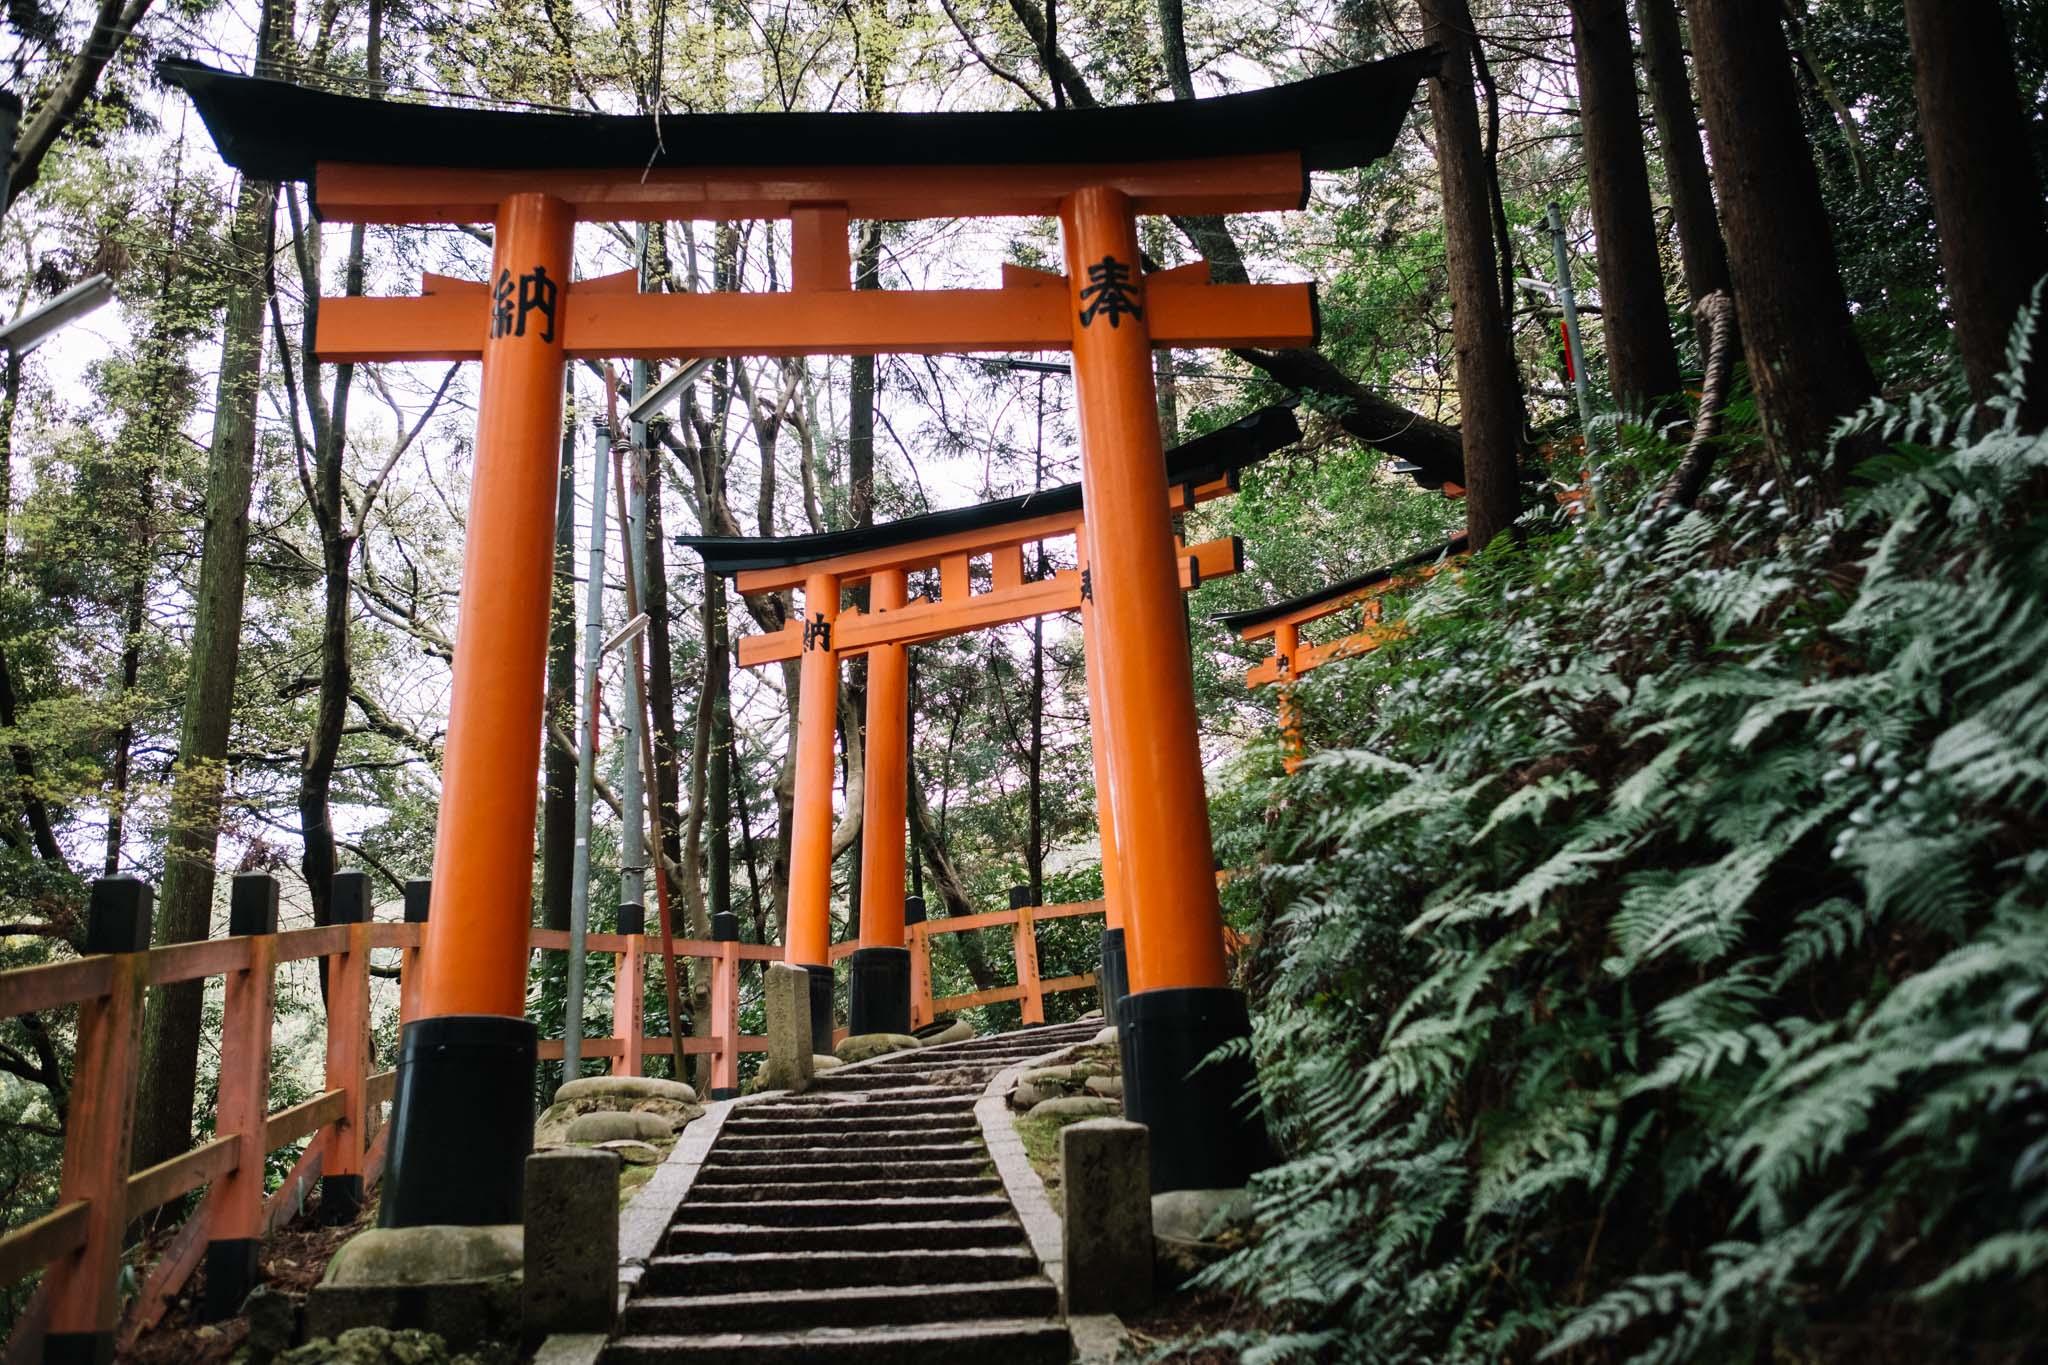 chris_eberhardt_japan_travel_reise_nippon-49.jpg